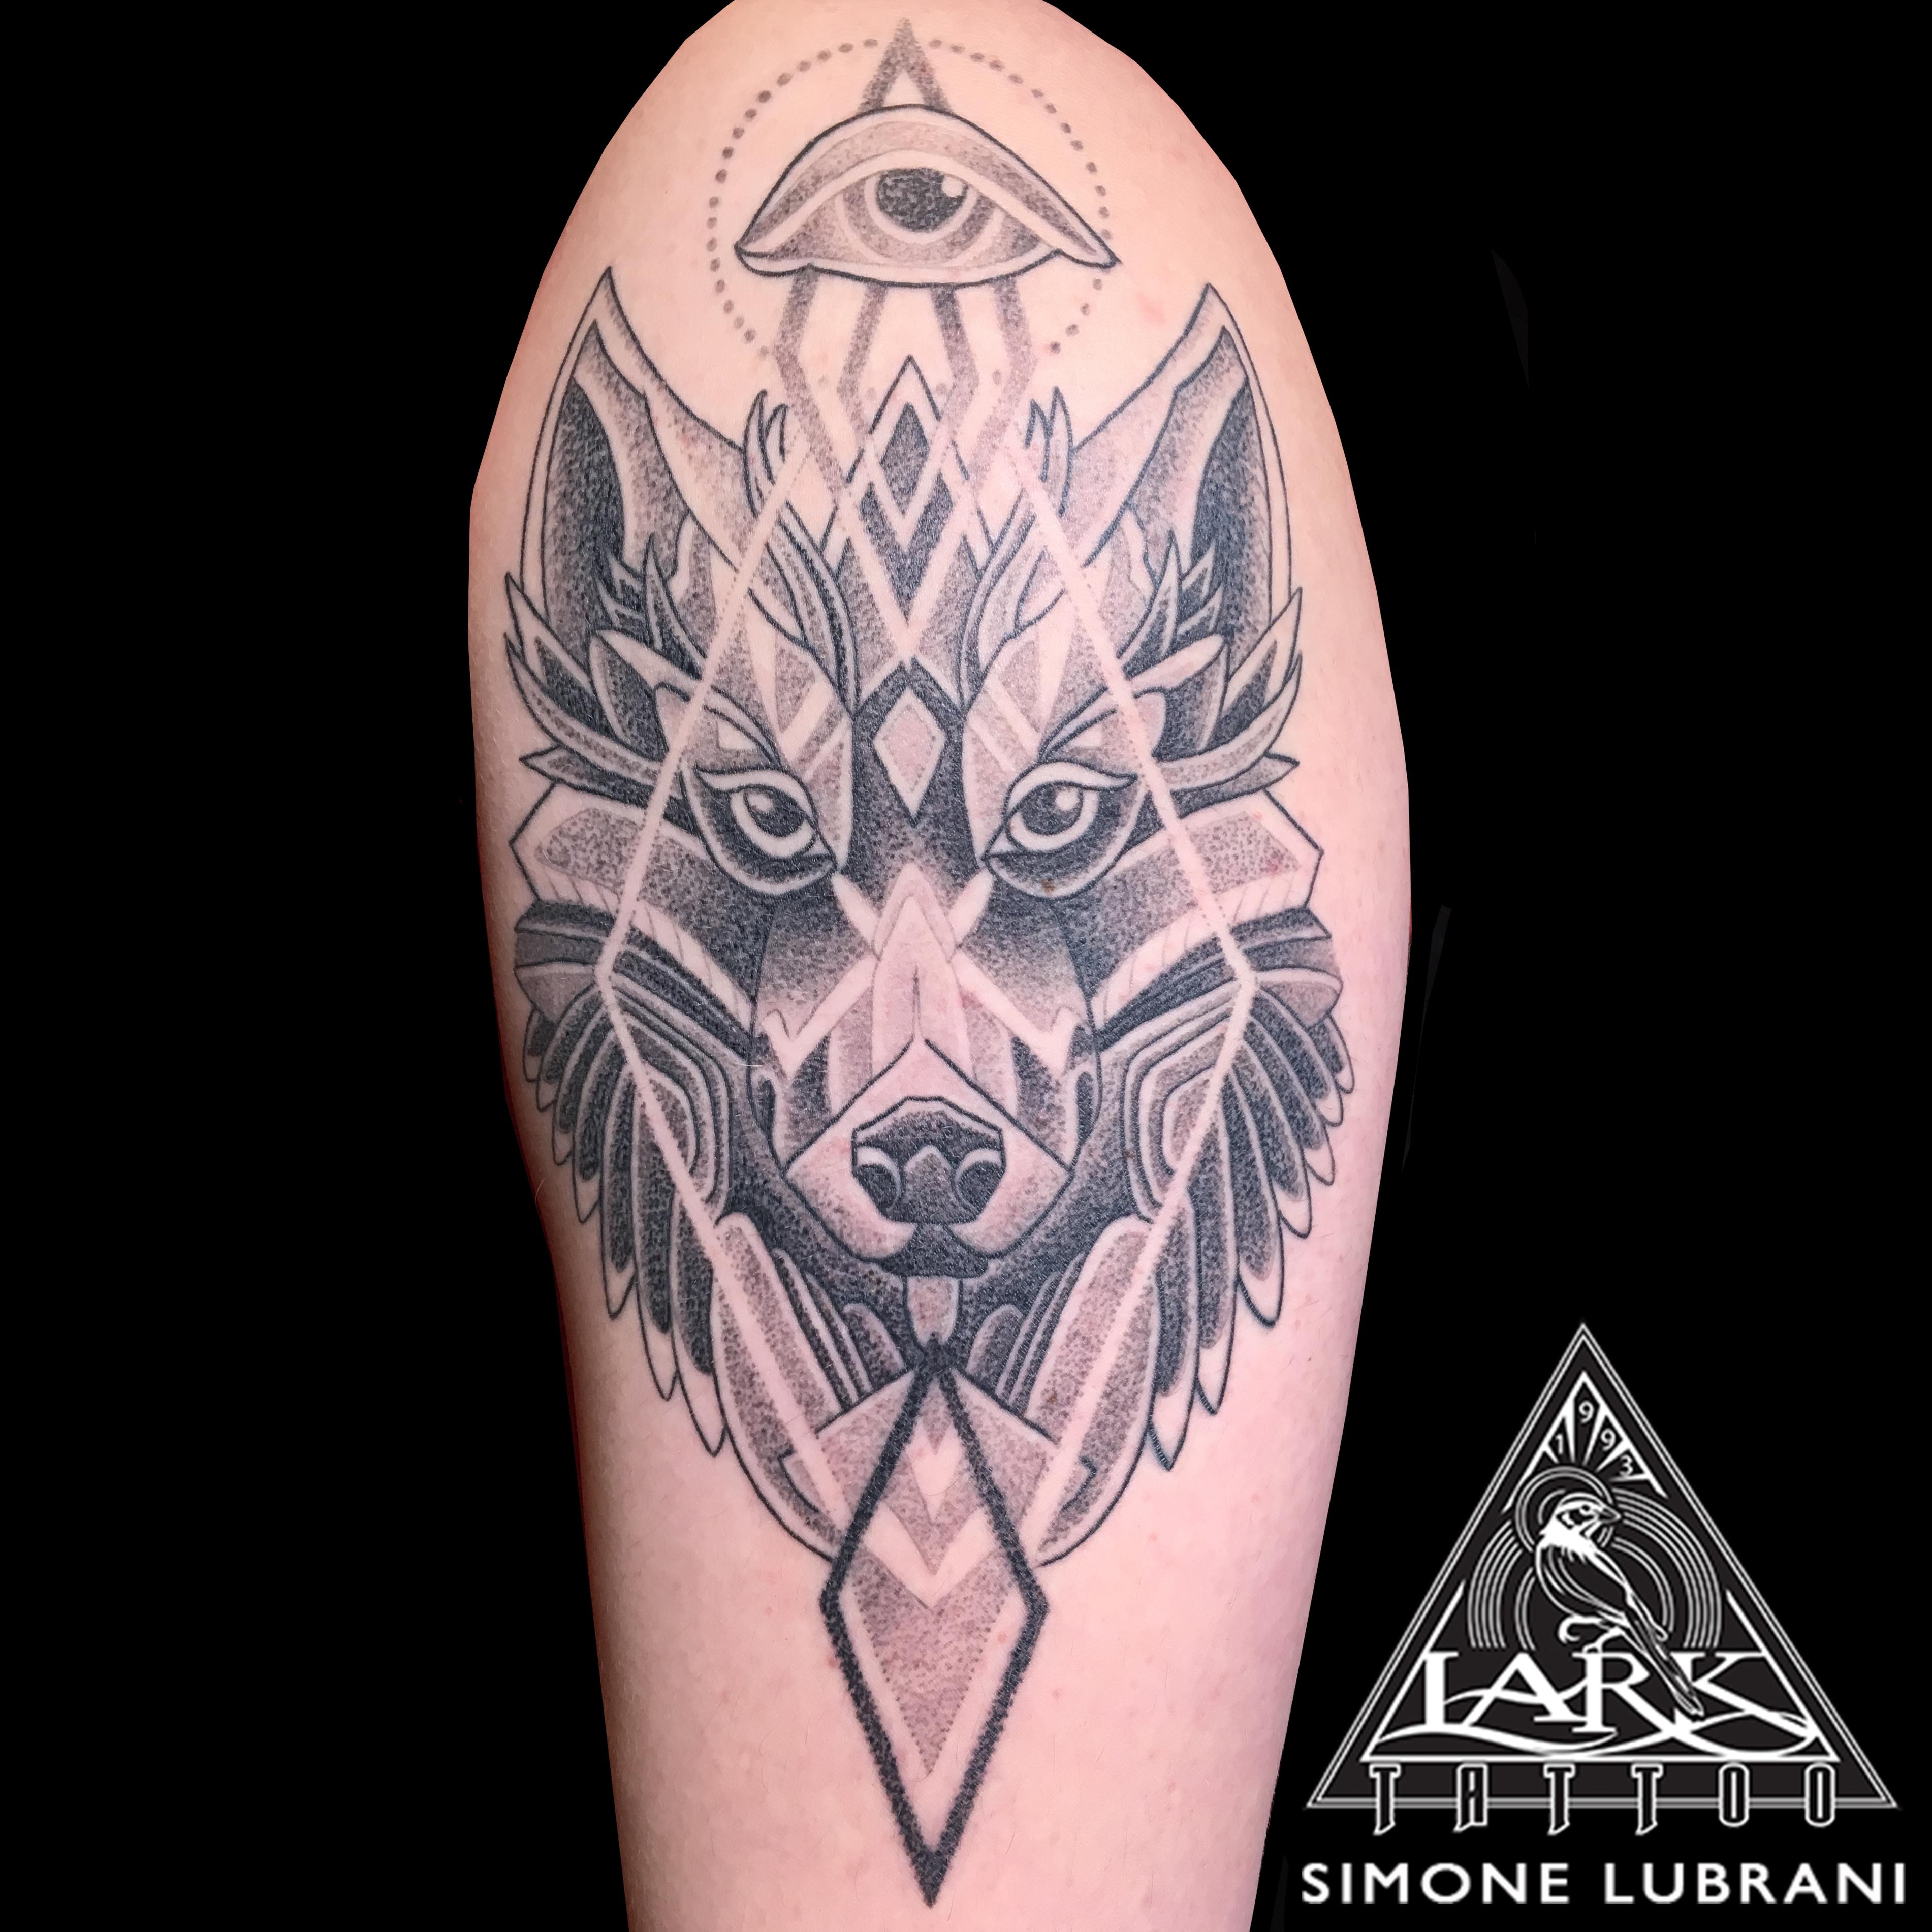 #blackwork #blackworktattoo #geometric #geometrictattoo #wolf #wolftattoo #dotwork #dotworktattoo #armtattoo #bng #bngtattoo #blackandgraytattoo #blackandgreytattoo #tattoo #tattoos #tat #tats #tatts #tatted #tattedup #tattoist #tattooed #inked #inkedup #ink #tattoooftheday #amazingink #bodyart #tattooig #tattoosofinstagram #instatats #larktattoo #larktattoos #larktattoowestbury #westbury #longisland #NY #NewYork #usa #art